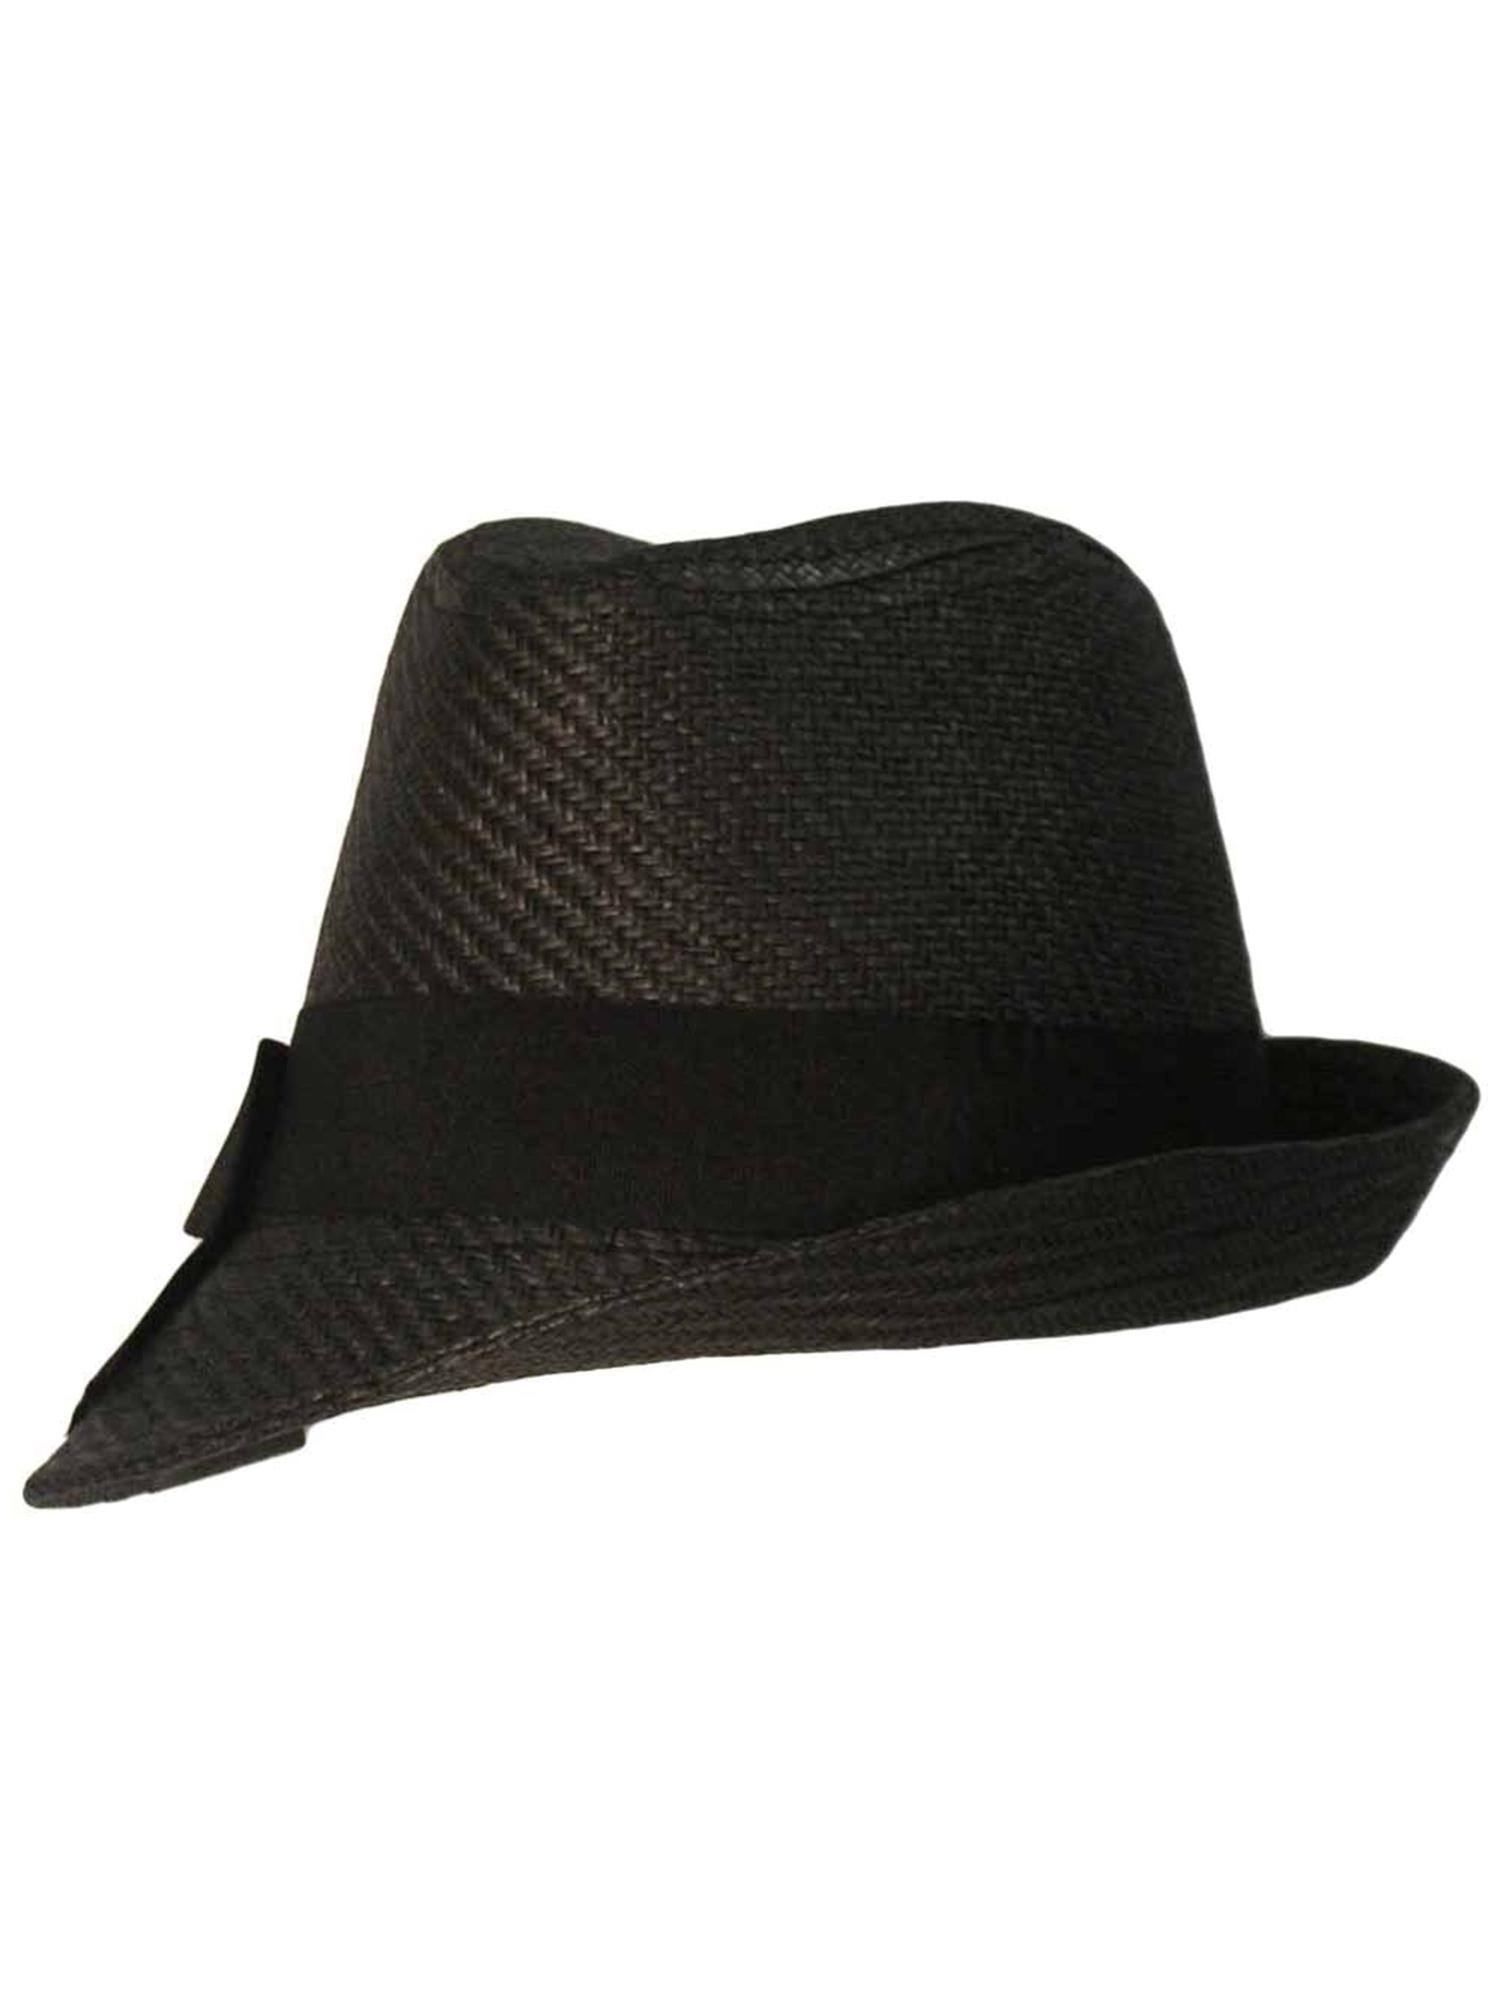 Luxury Divas Panama Style Wool Fedora Hat with Buckle